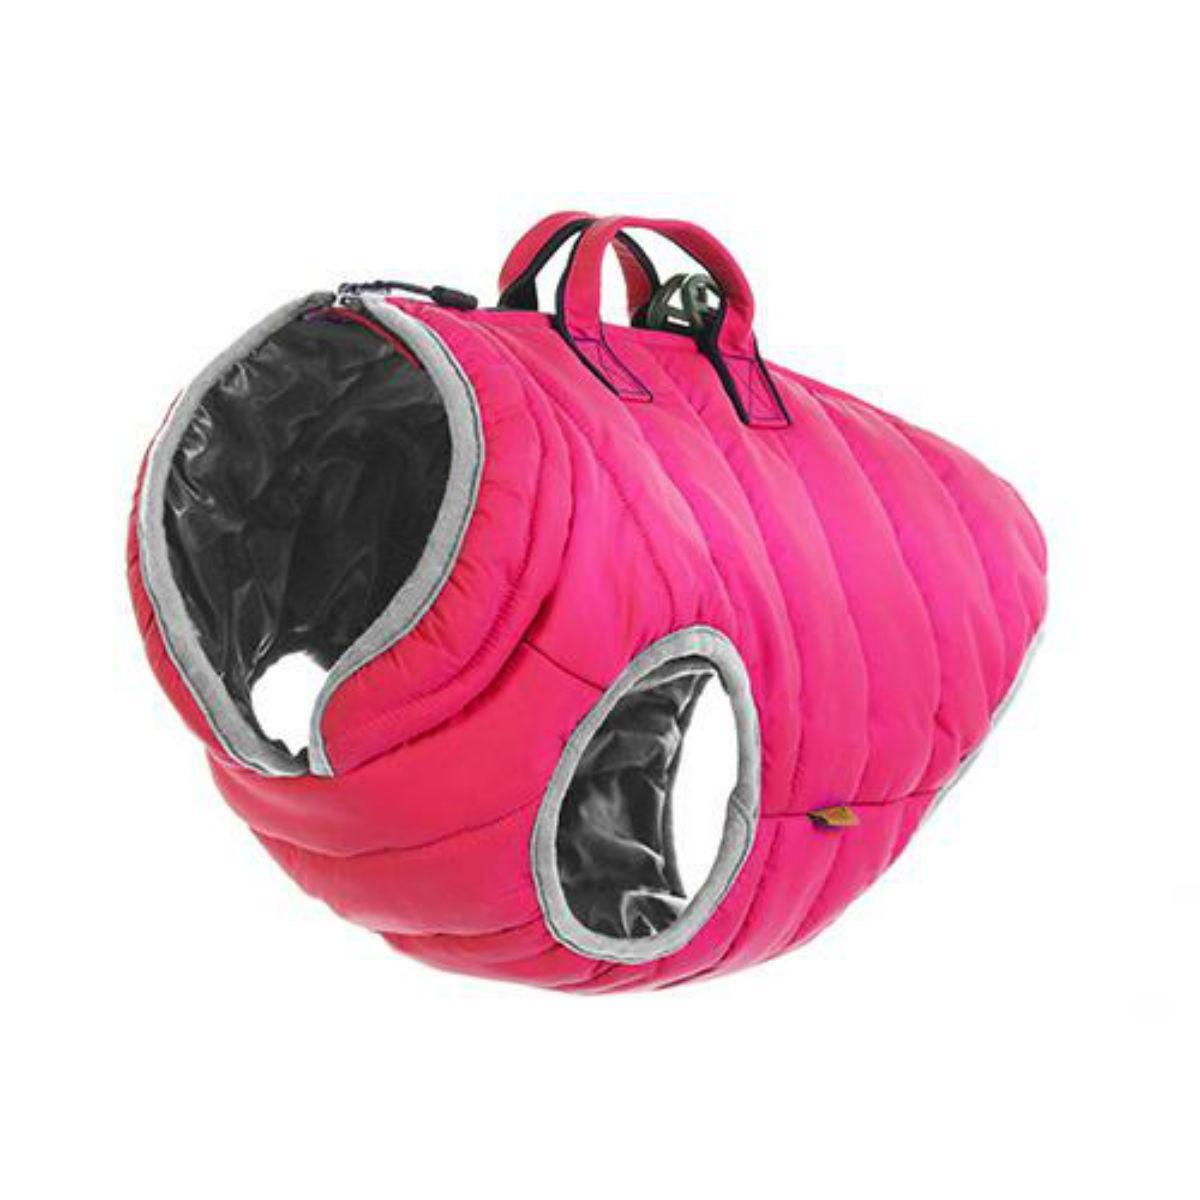 Gooby Padded Lift Dog Vest - Pink